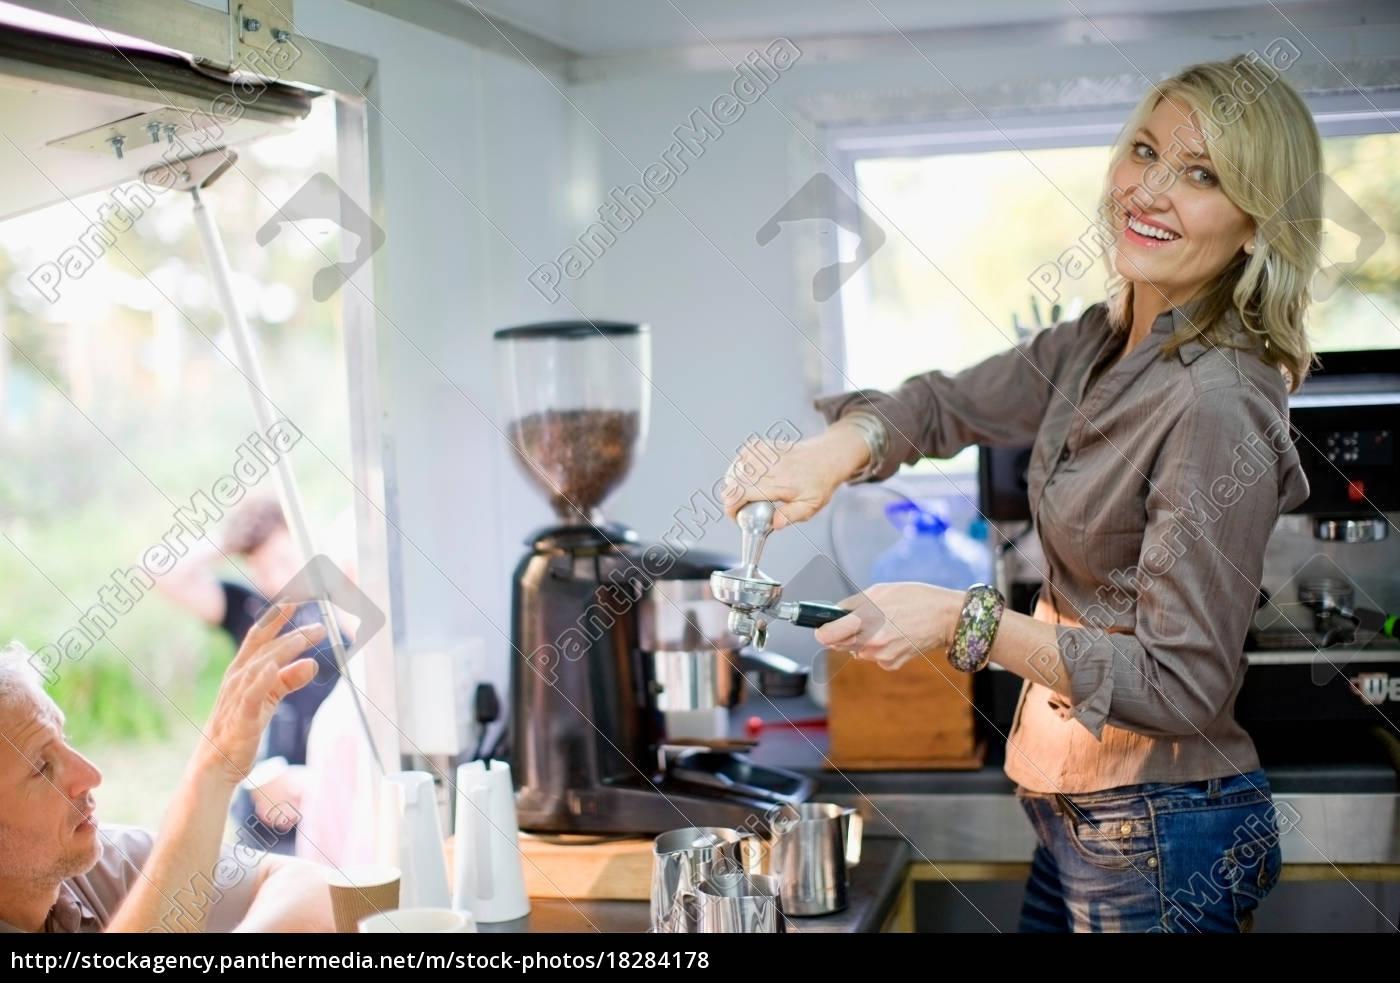 frau, macht, kaffee, im, lebensmittelwagen - 18284178